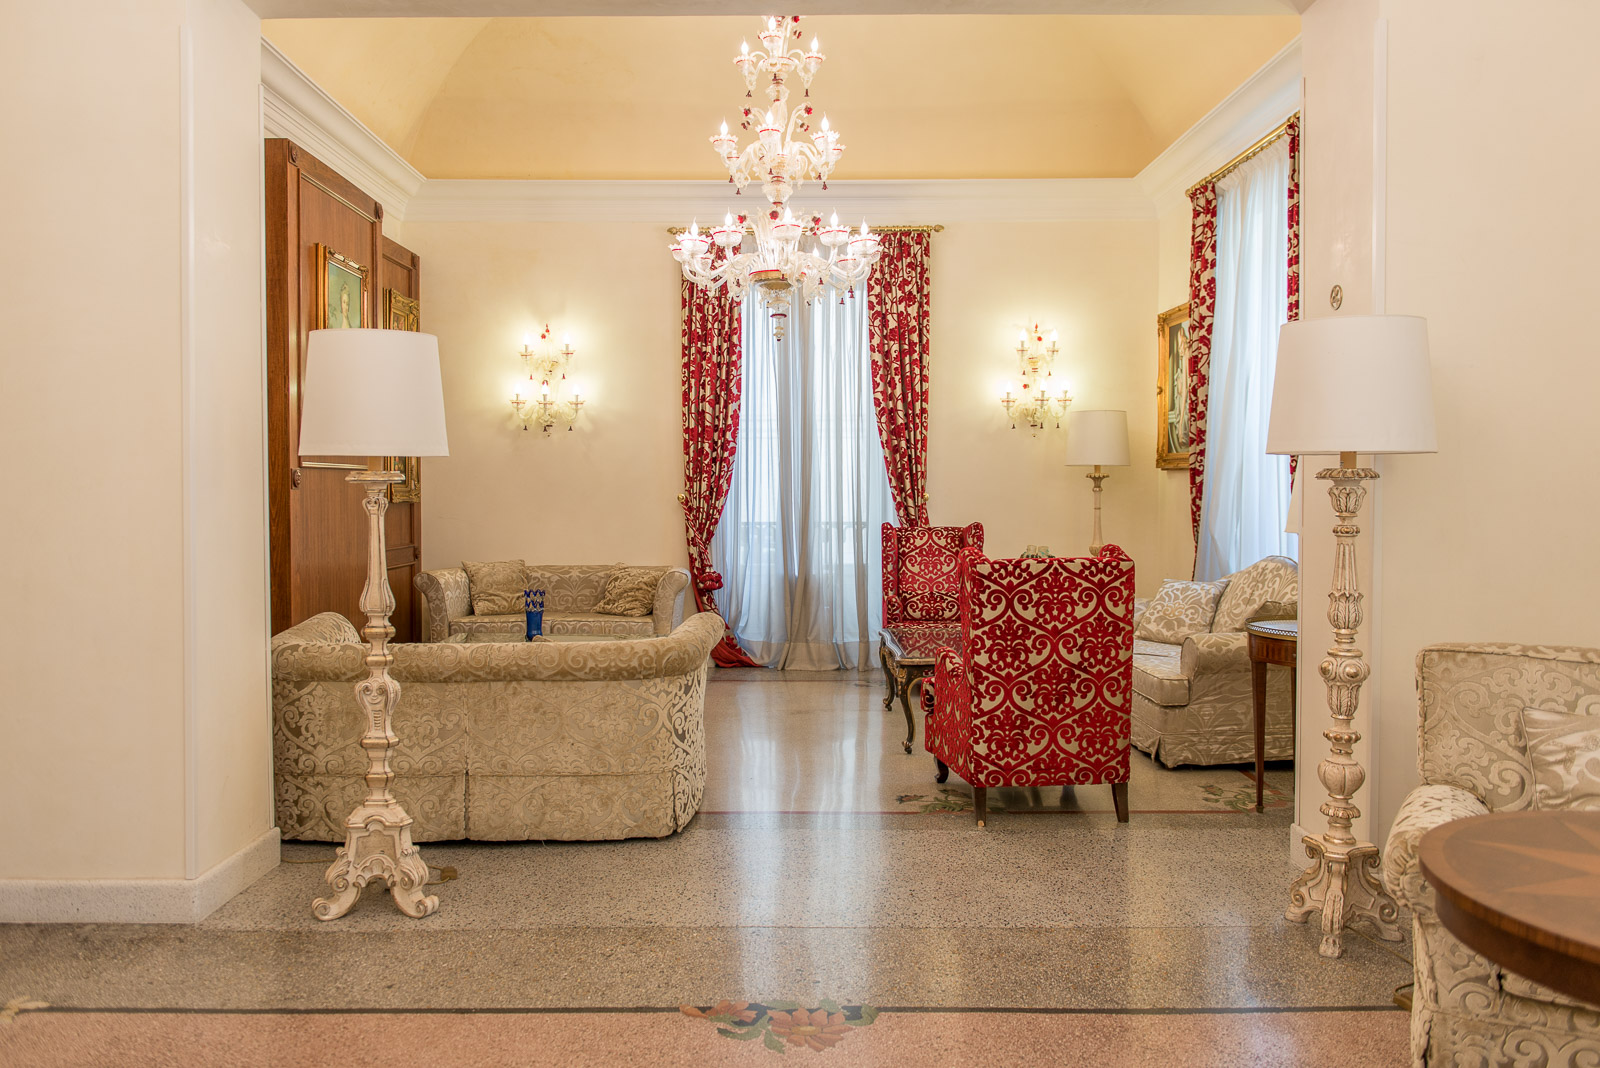 https://www.orlandinifrancesco.com/wp/wp-content/uploads/2018/09/Grand-Hotel-Lecce-7.jpg